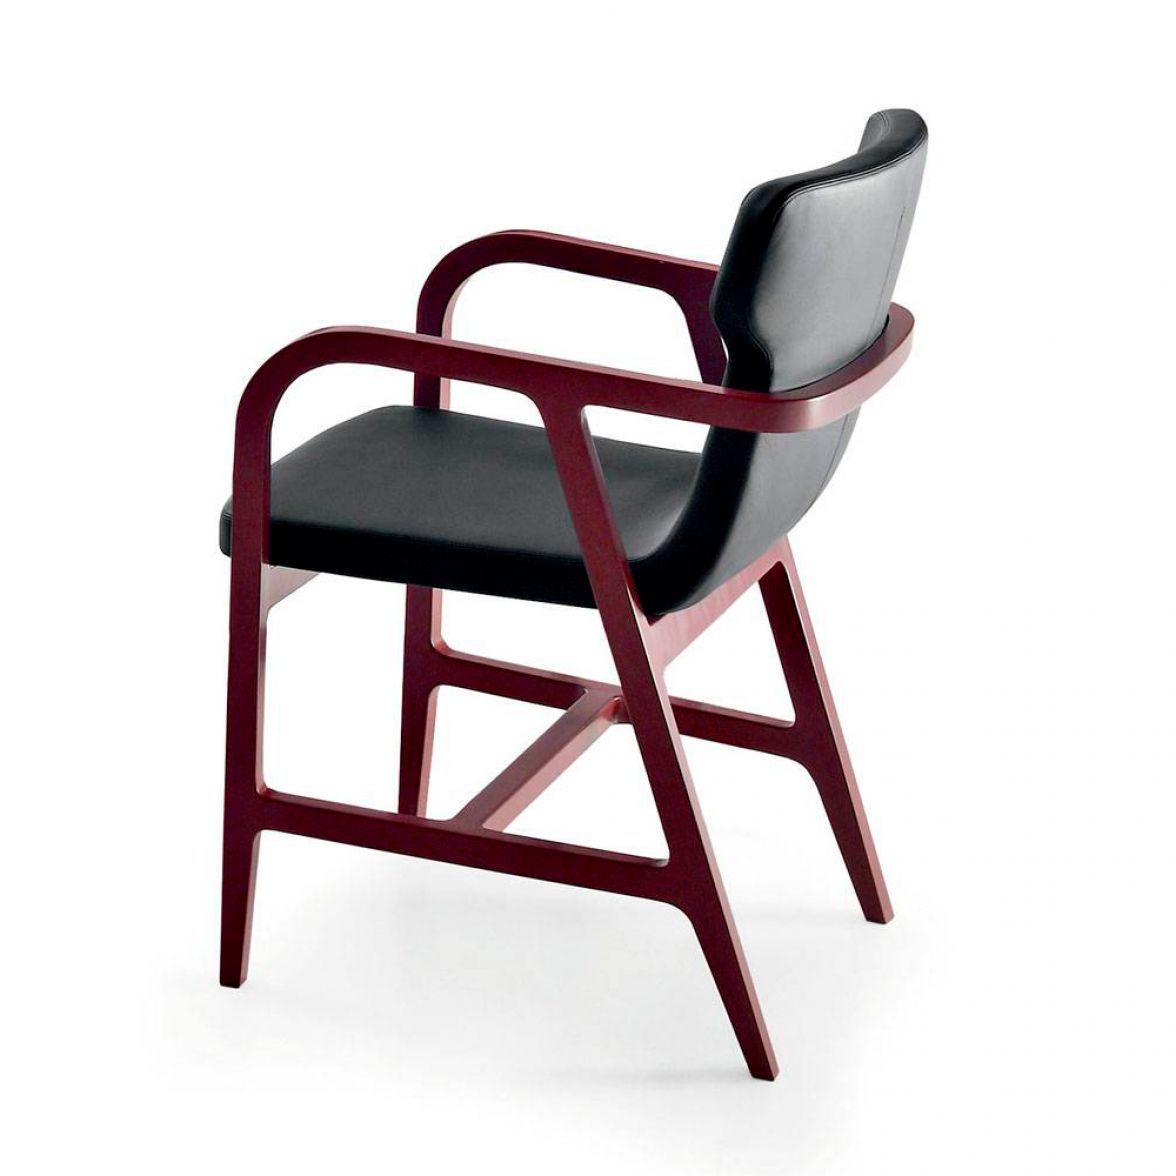 Fulgens chair